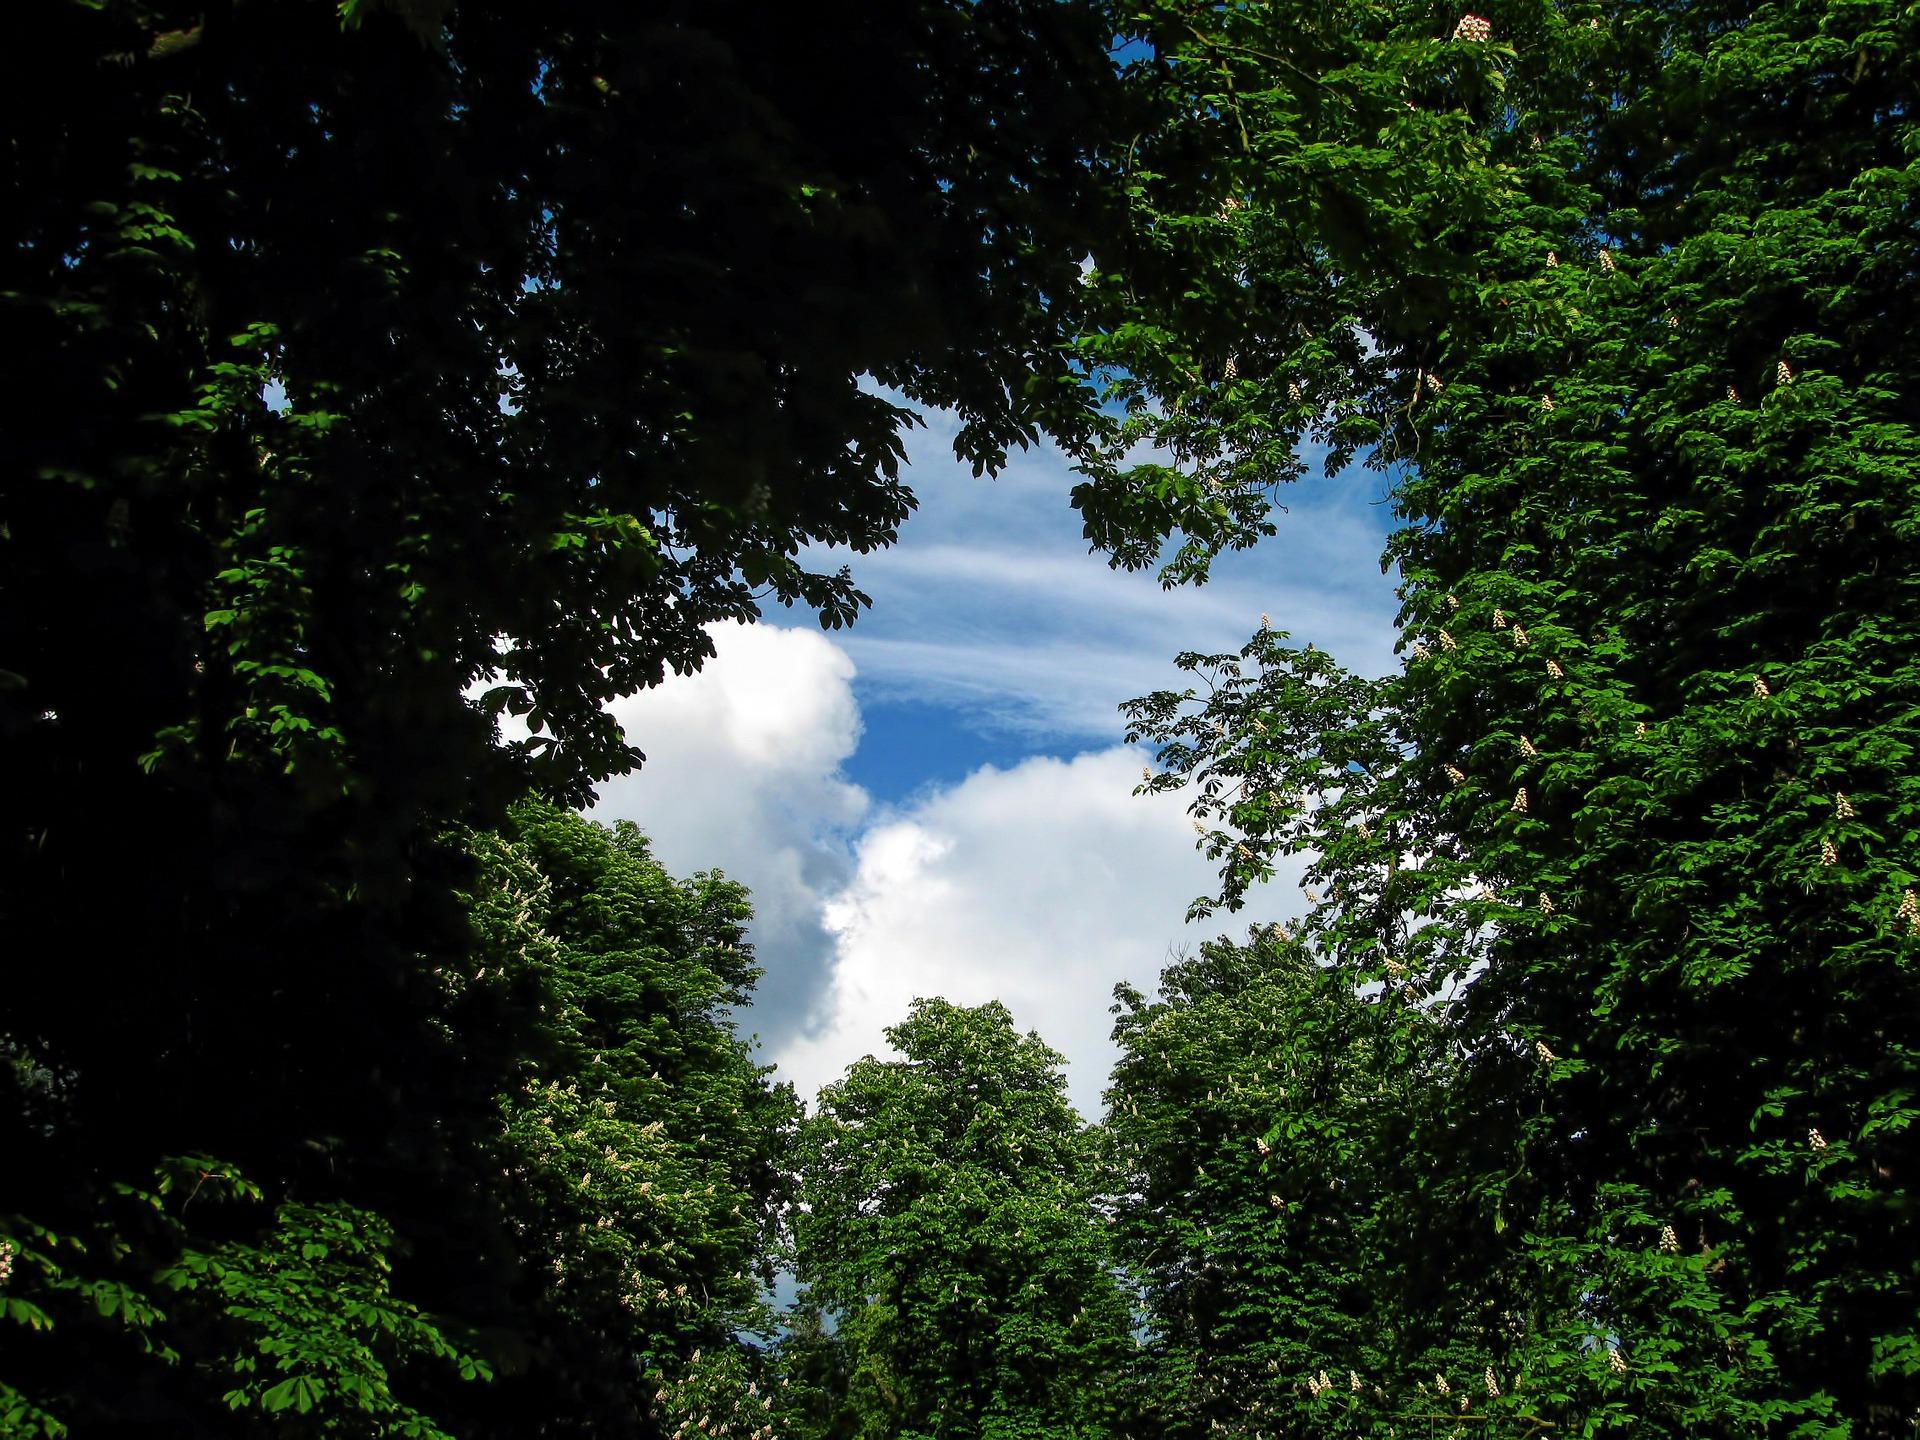 tree-220664_1920.jpg